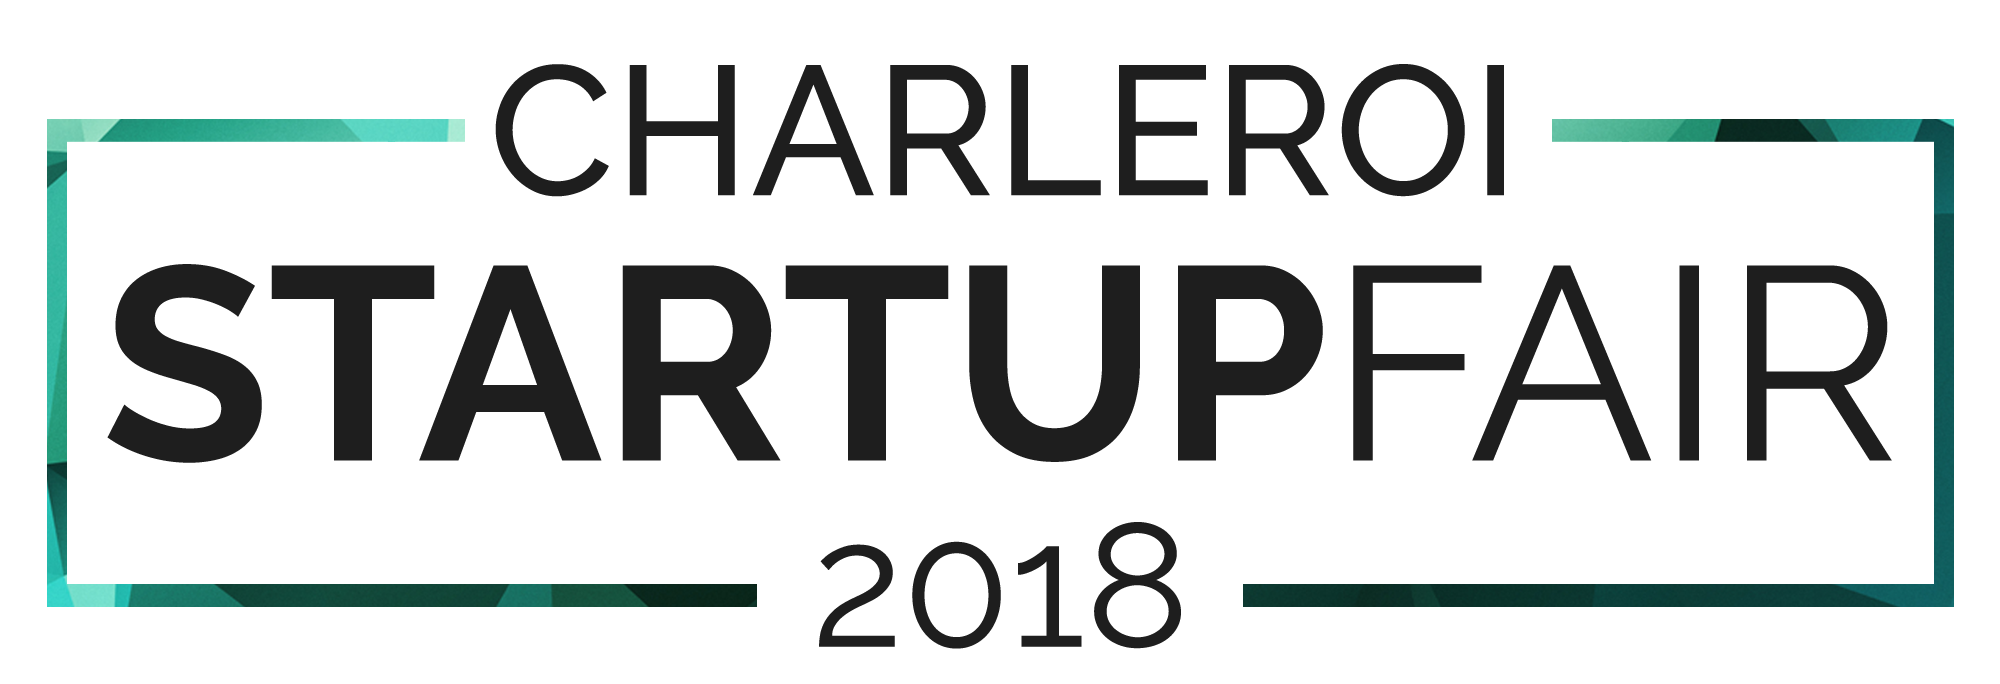 charleroi startup fair